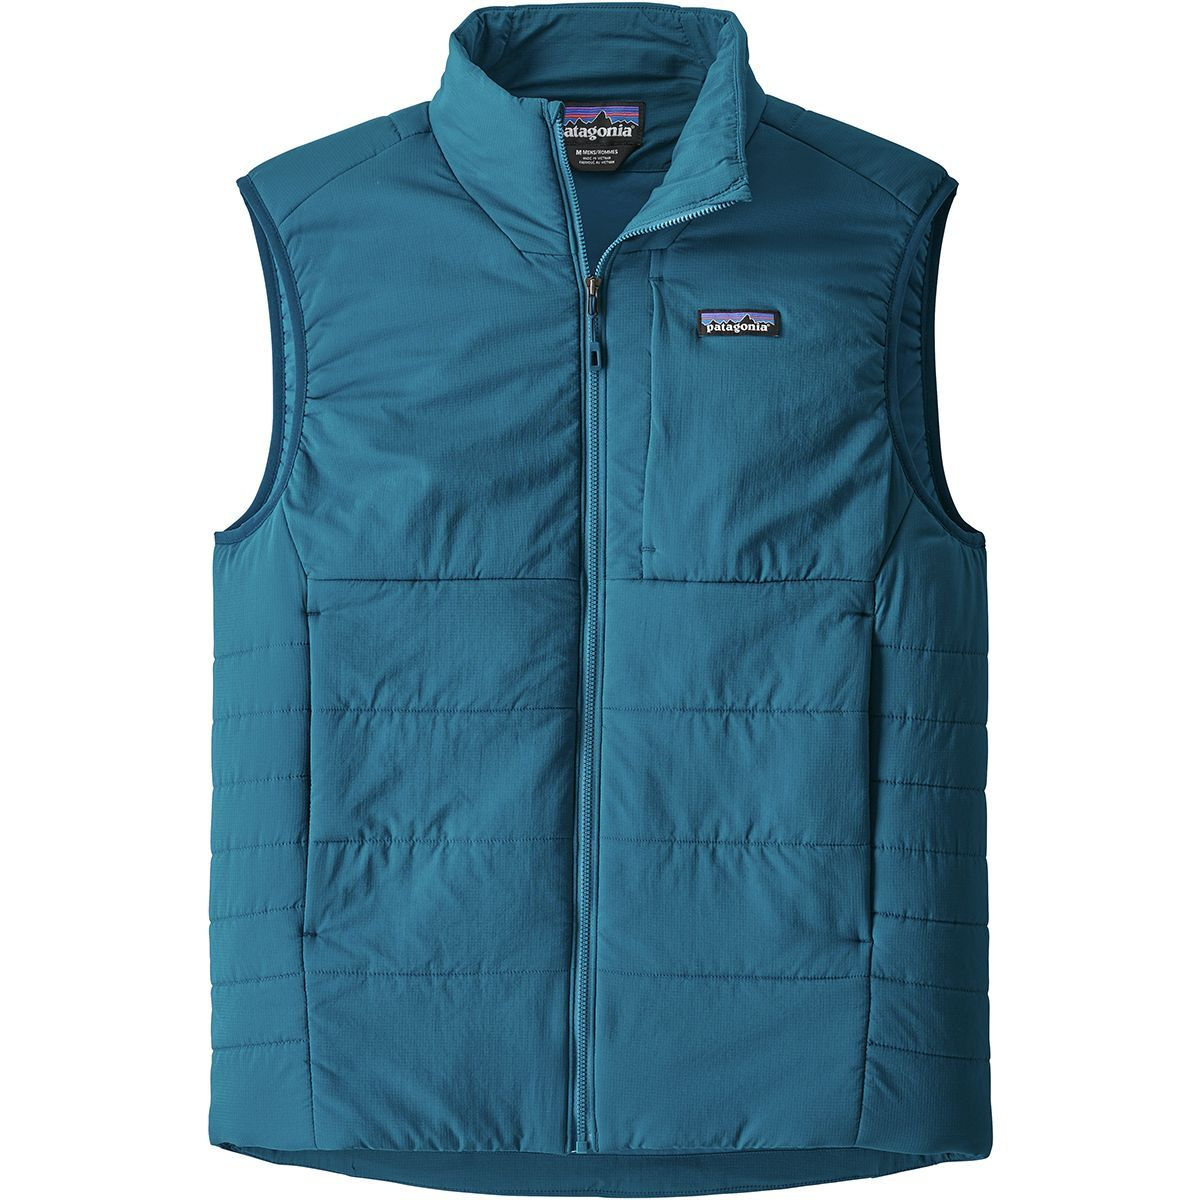 Patagonia NanoAir Insulated Vest Men's Mens vest